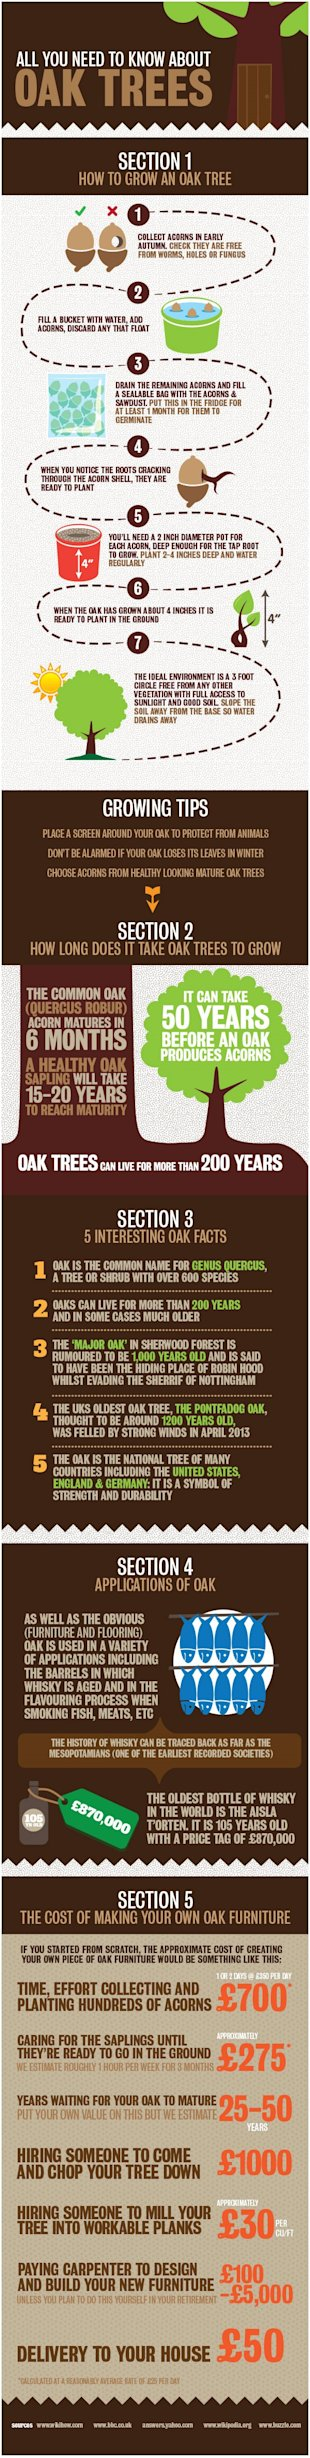 New Furniture: Flat Pack vs Solid Oak vs Grow Your Own image furnitureplusonline oak infographic